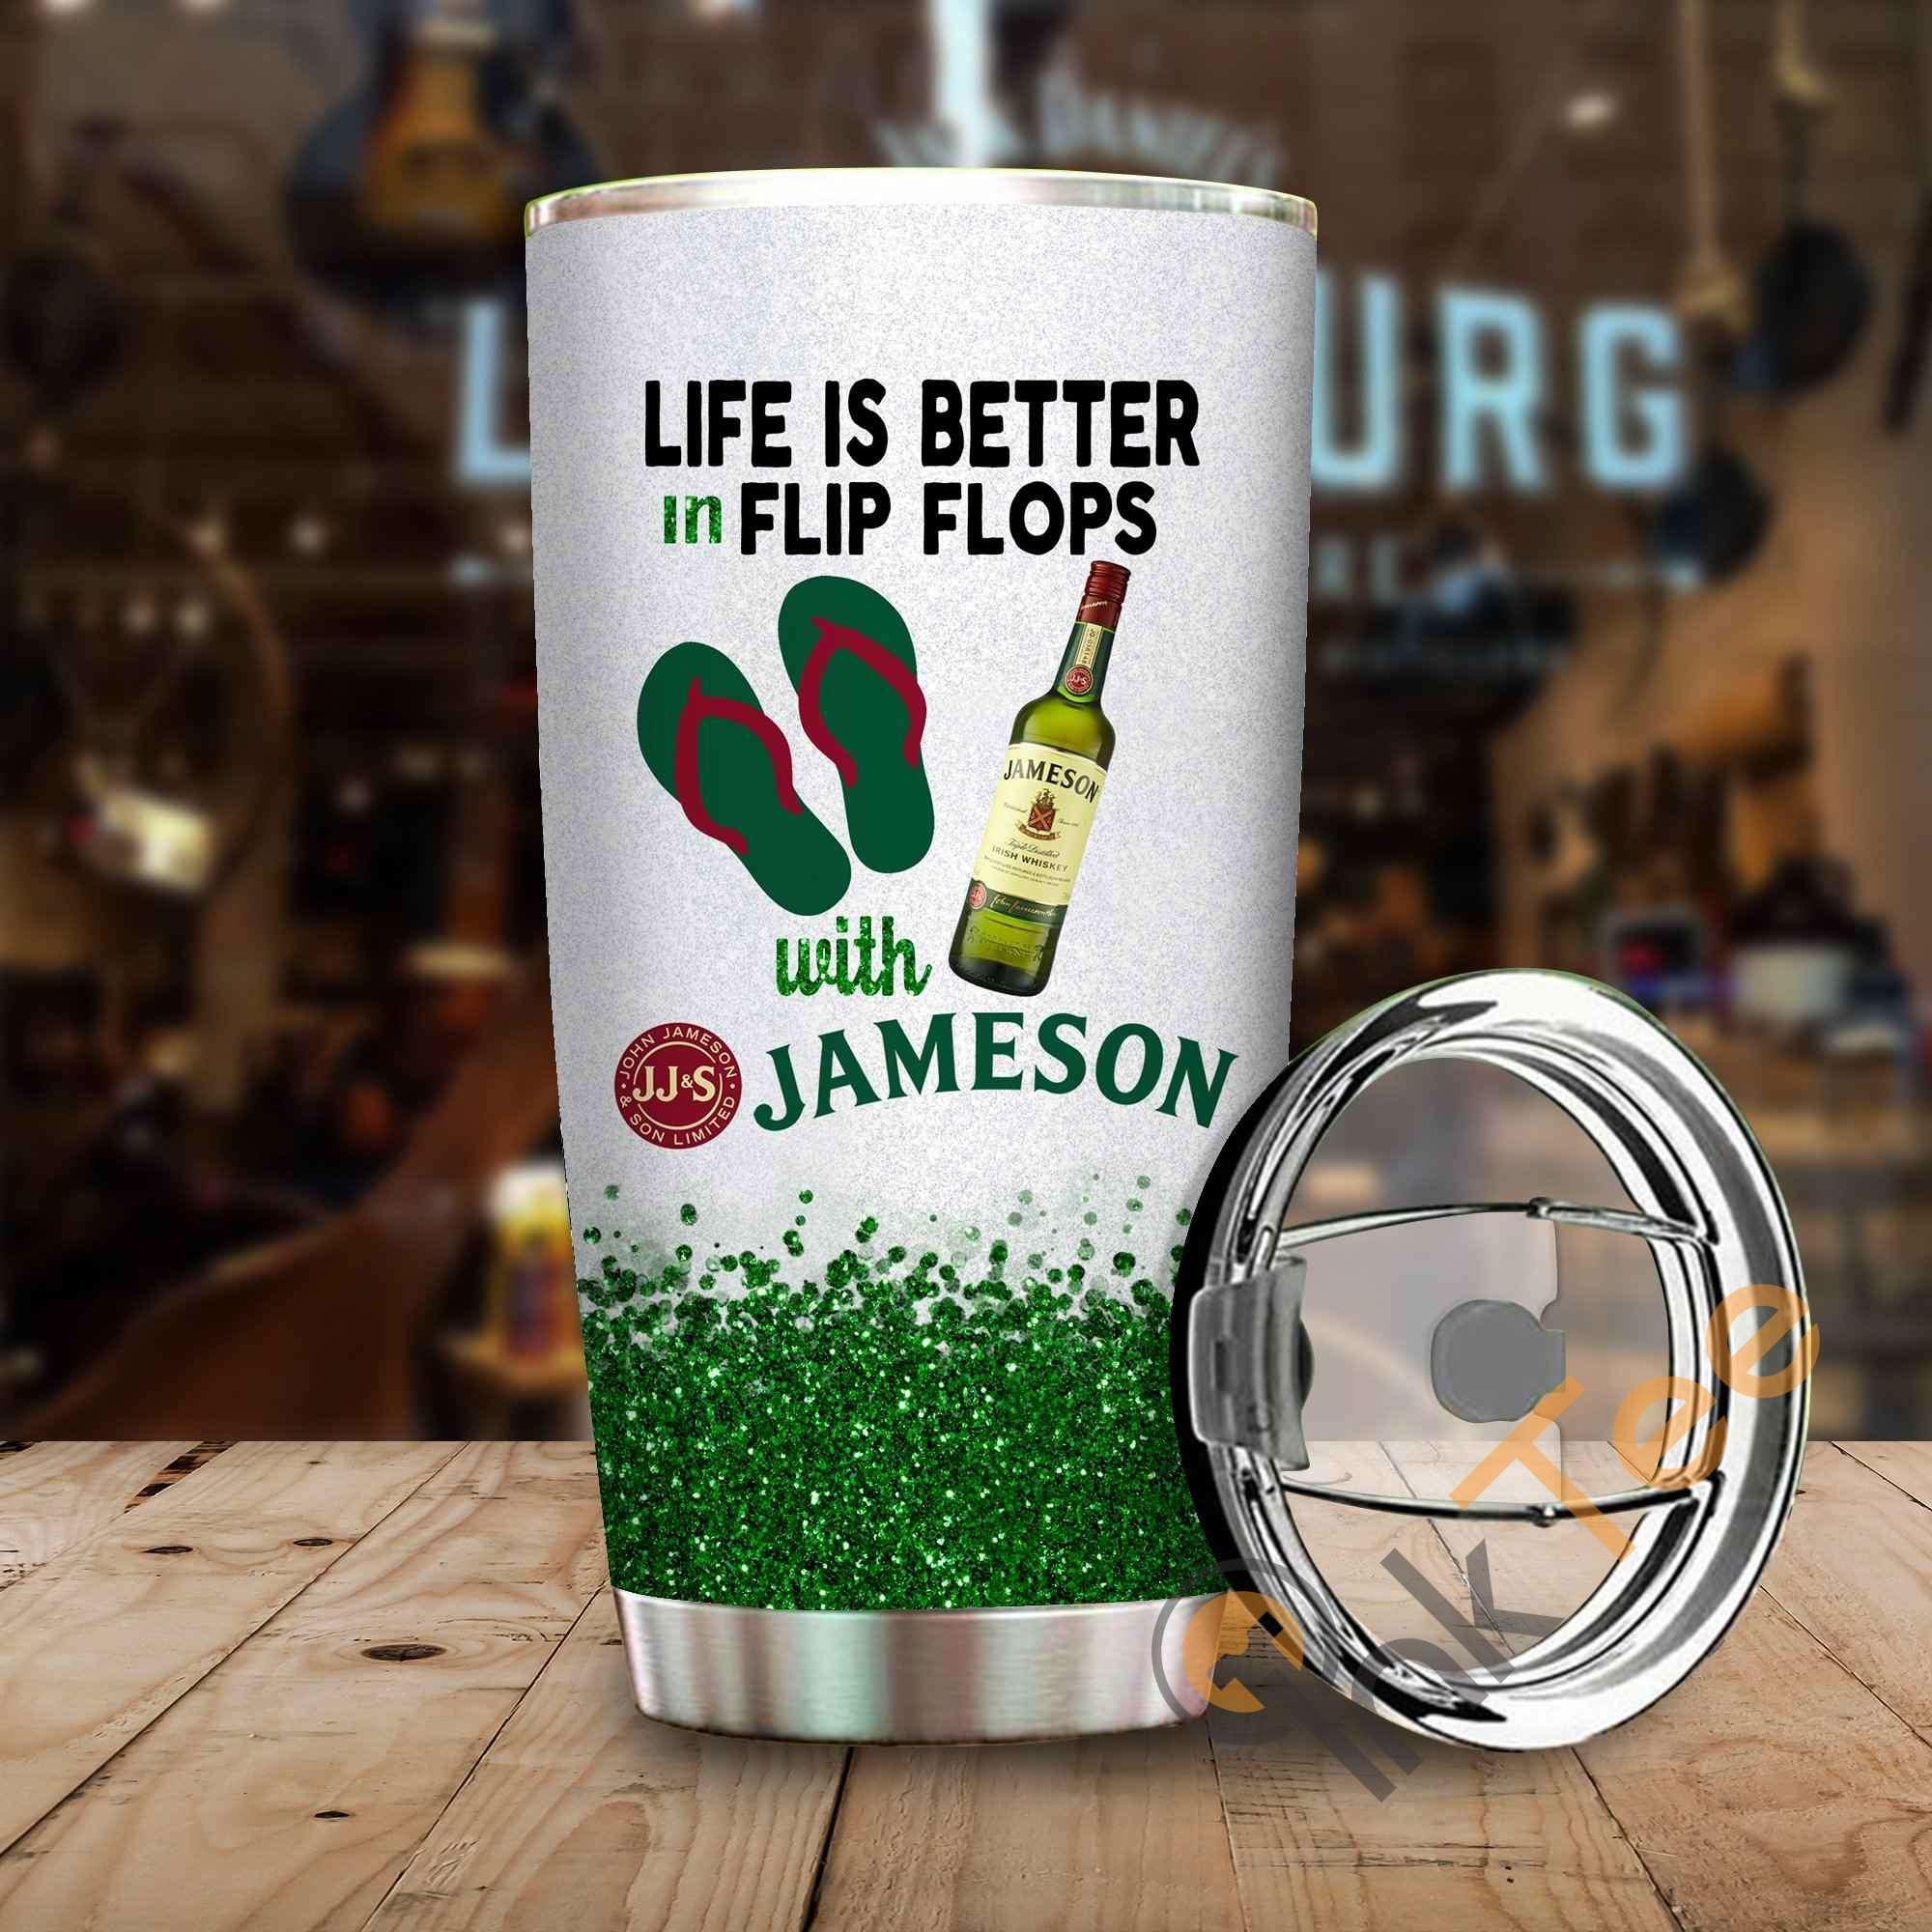 Life Is Better In Flip Flops With Jameson Amazon Best Seller Sku 3918 Stainless Steel Tumbler